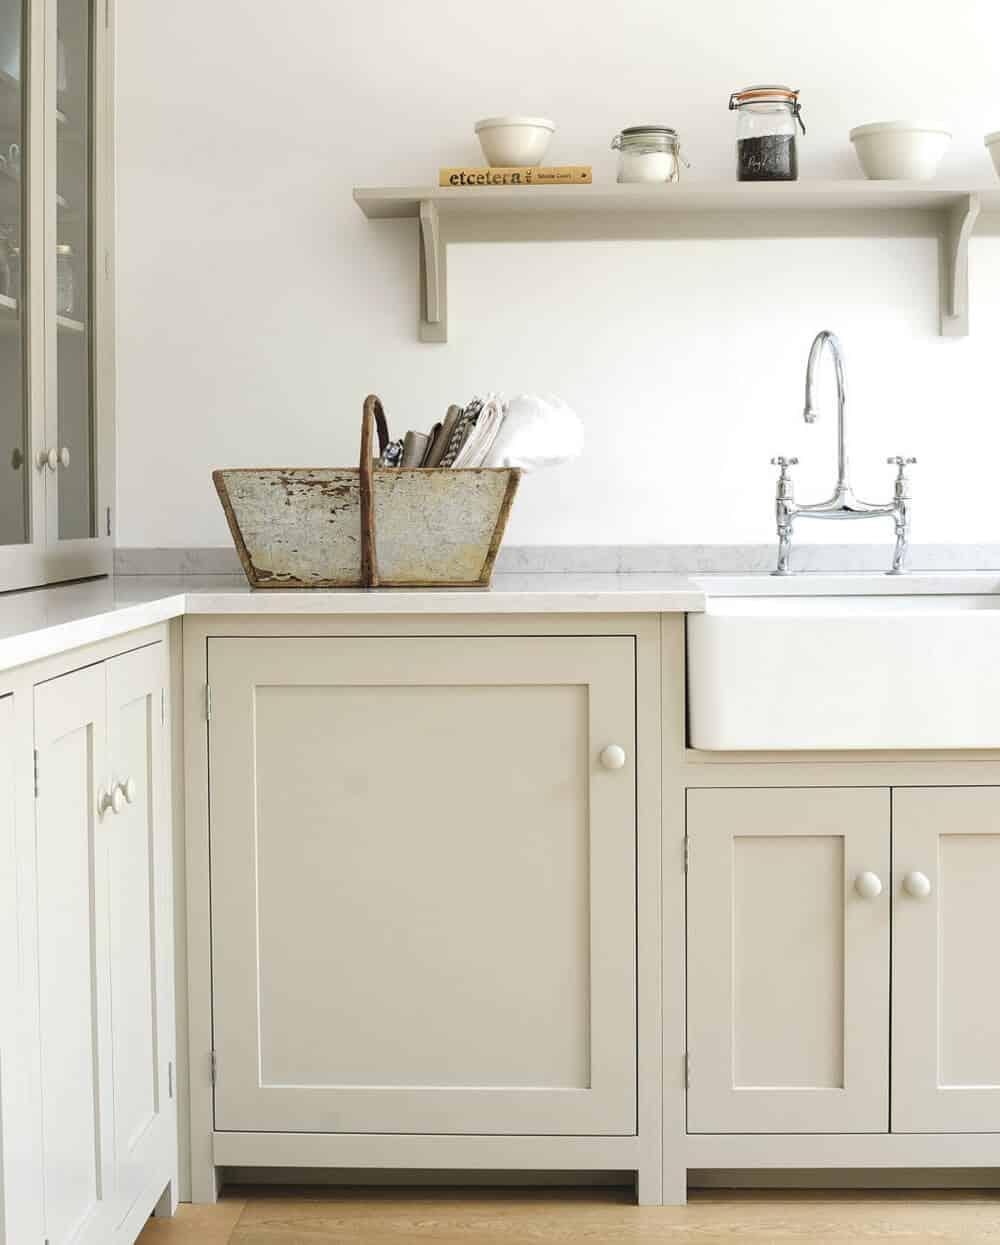 devol-kitchens__english-shaker_traditional-design_kitchen_simple_tudor_country_designer-spotlight_emily-henderson_inspiration_6